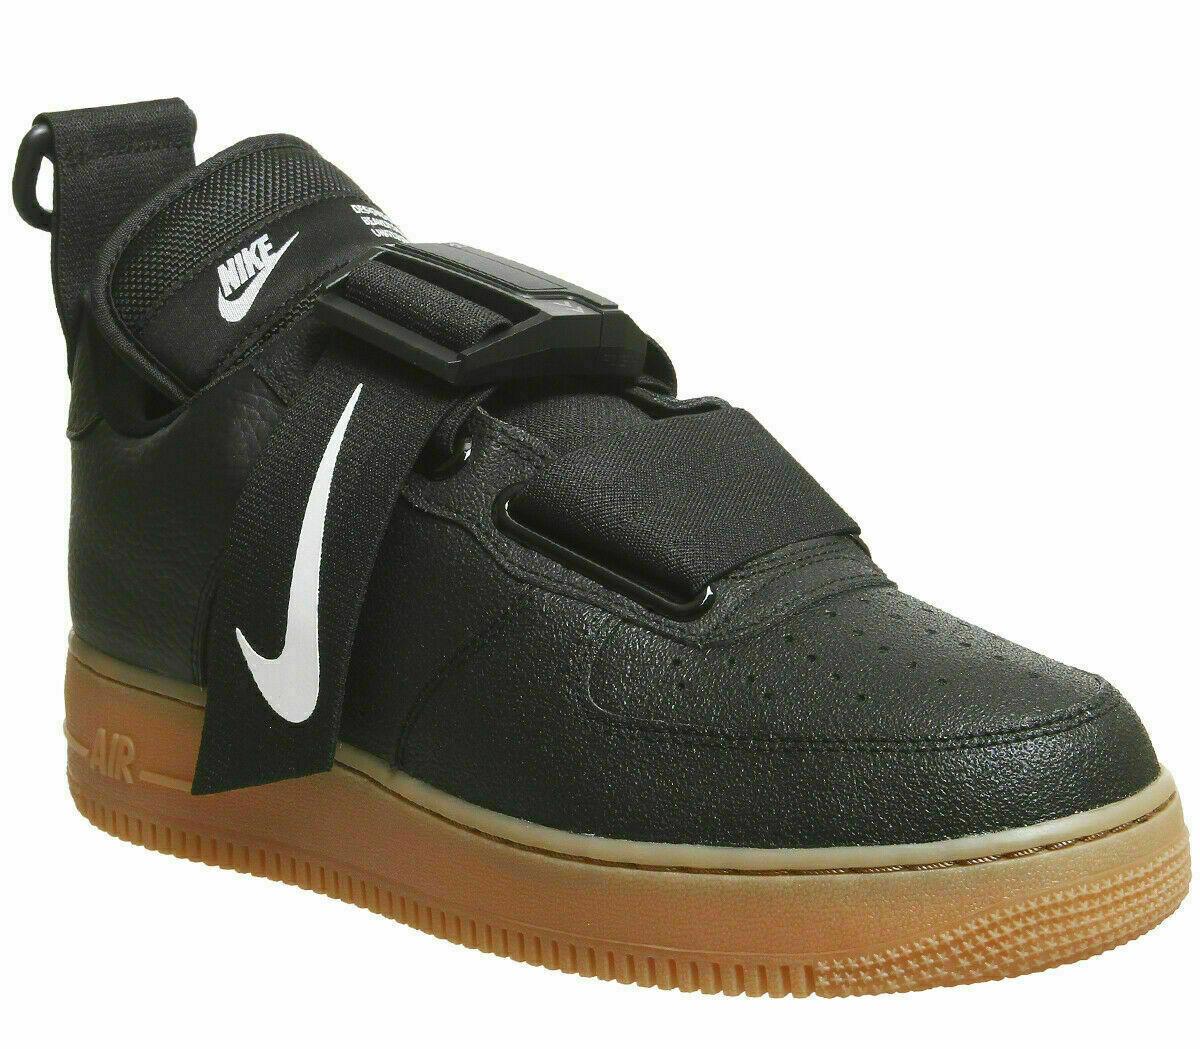 Nike Air Force 1 Utility Af1 Low Ao1531 002 Black White Gum Bottom Men's 9